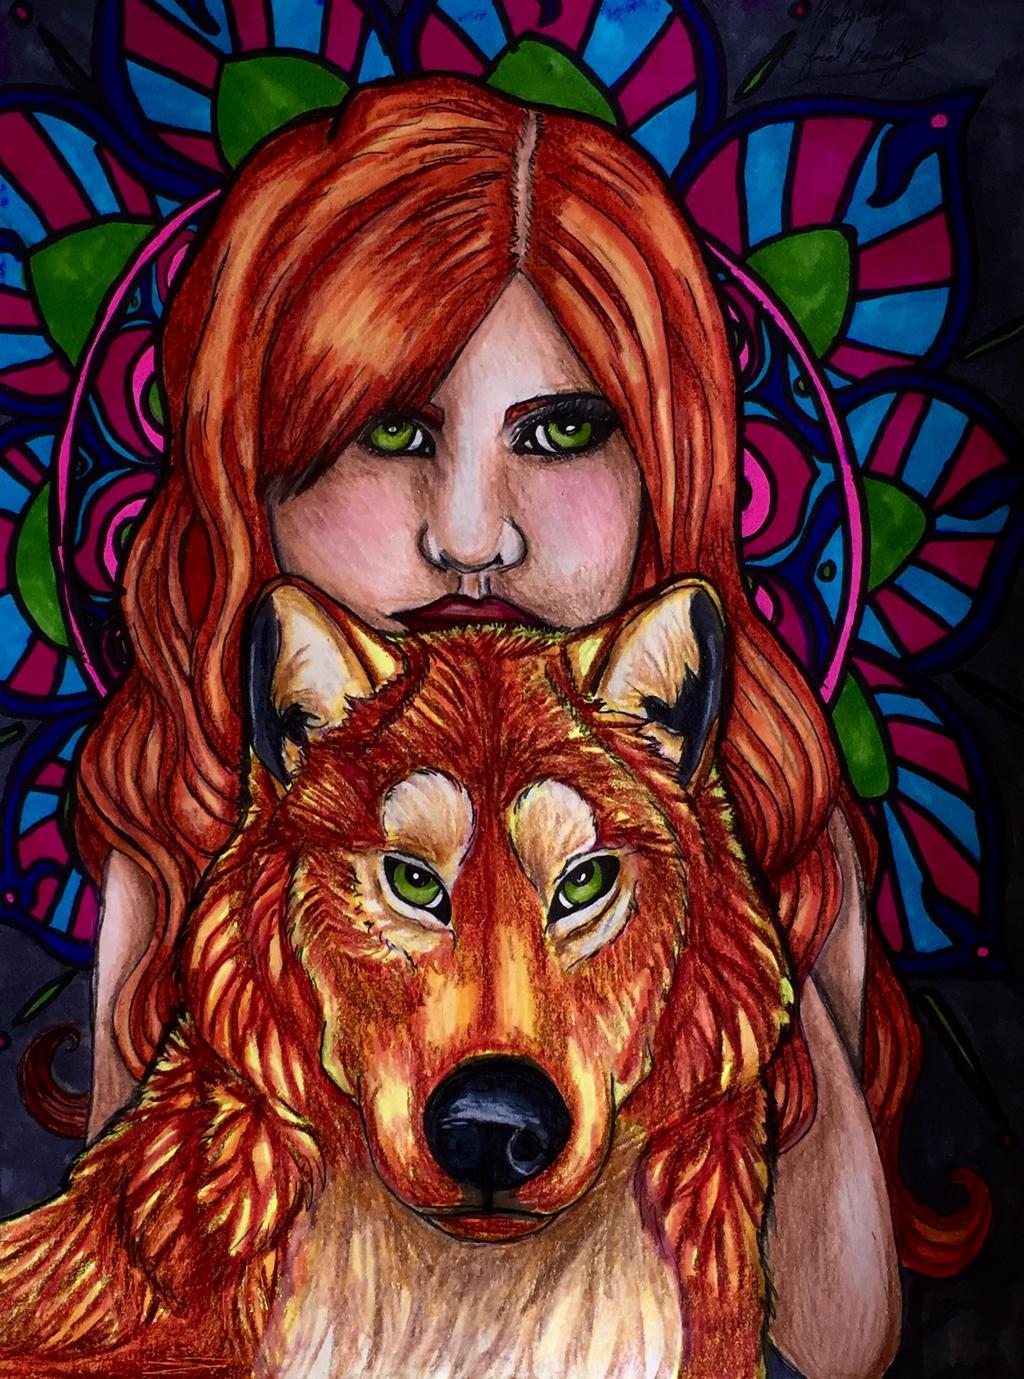 Feral beauty by pladywolf82